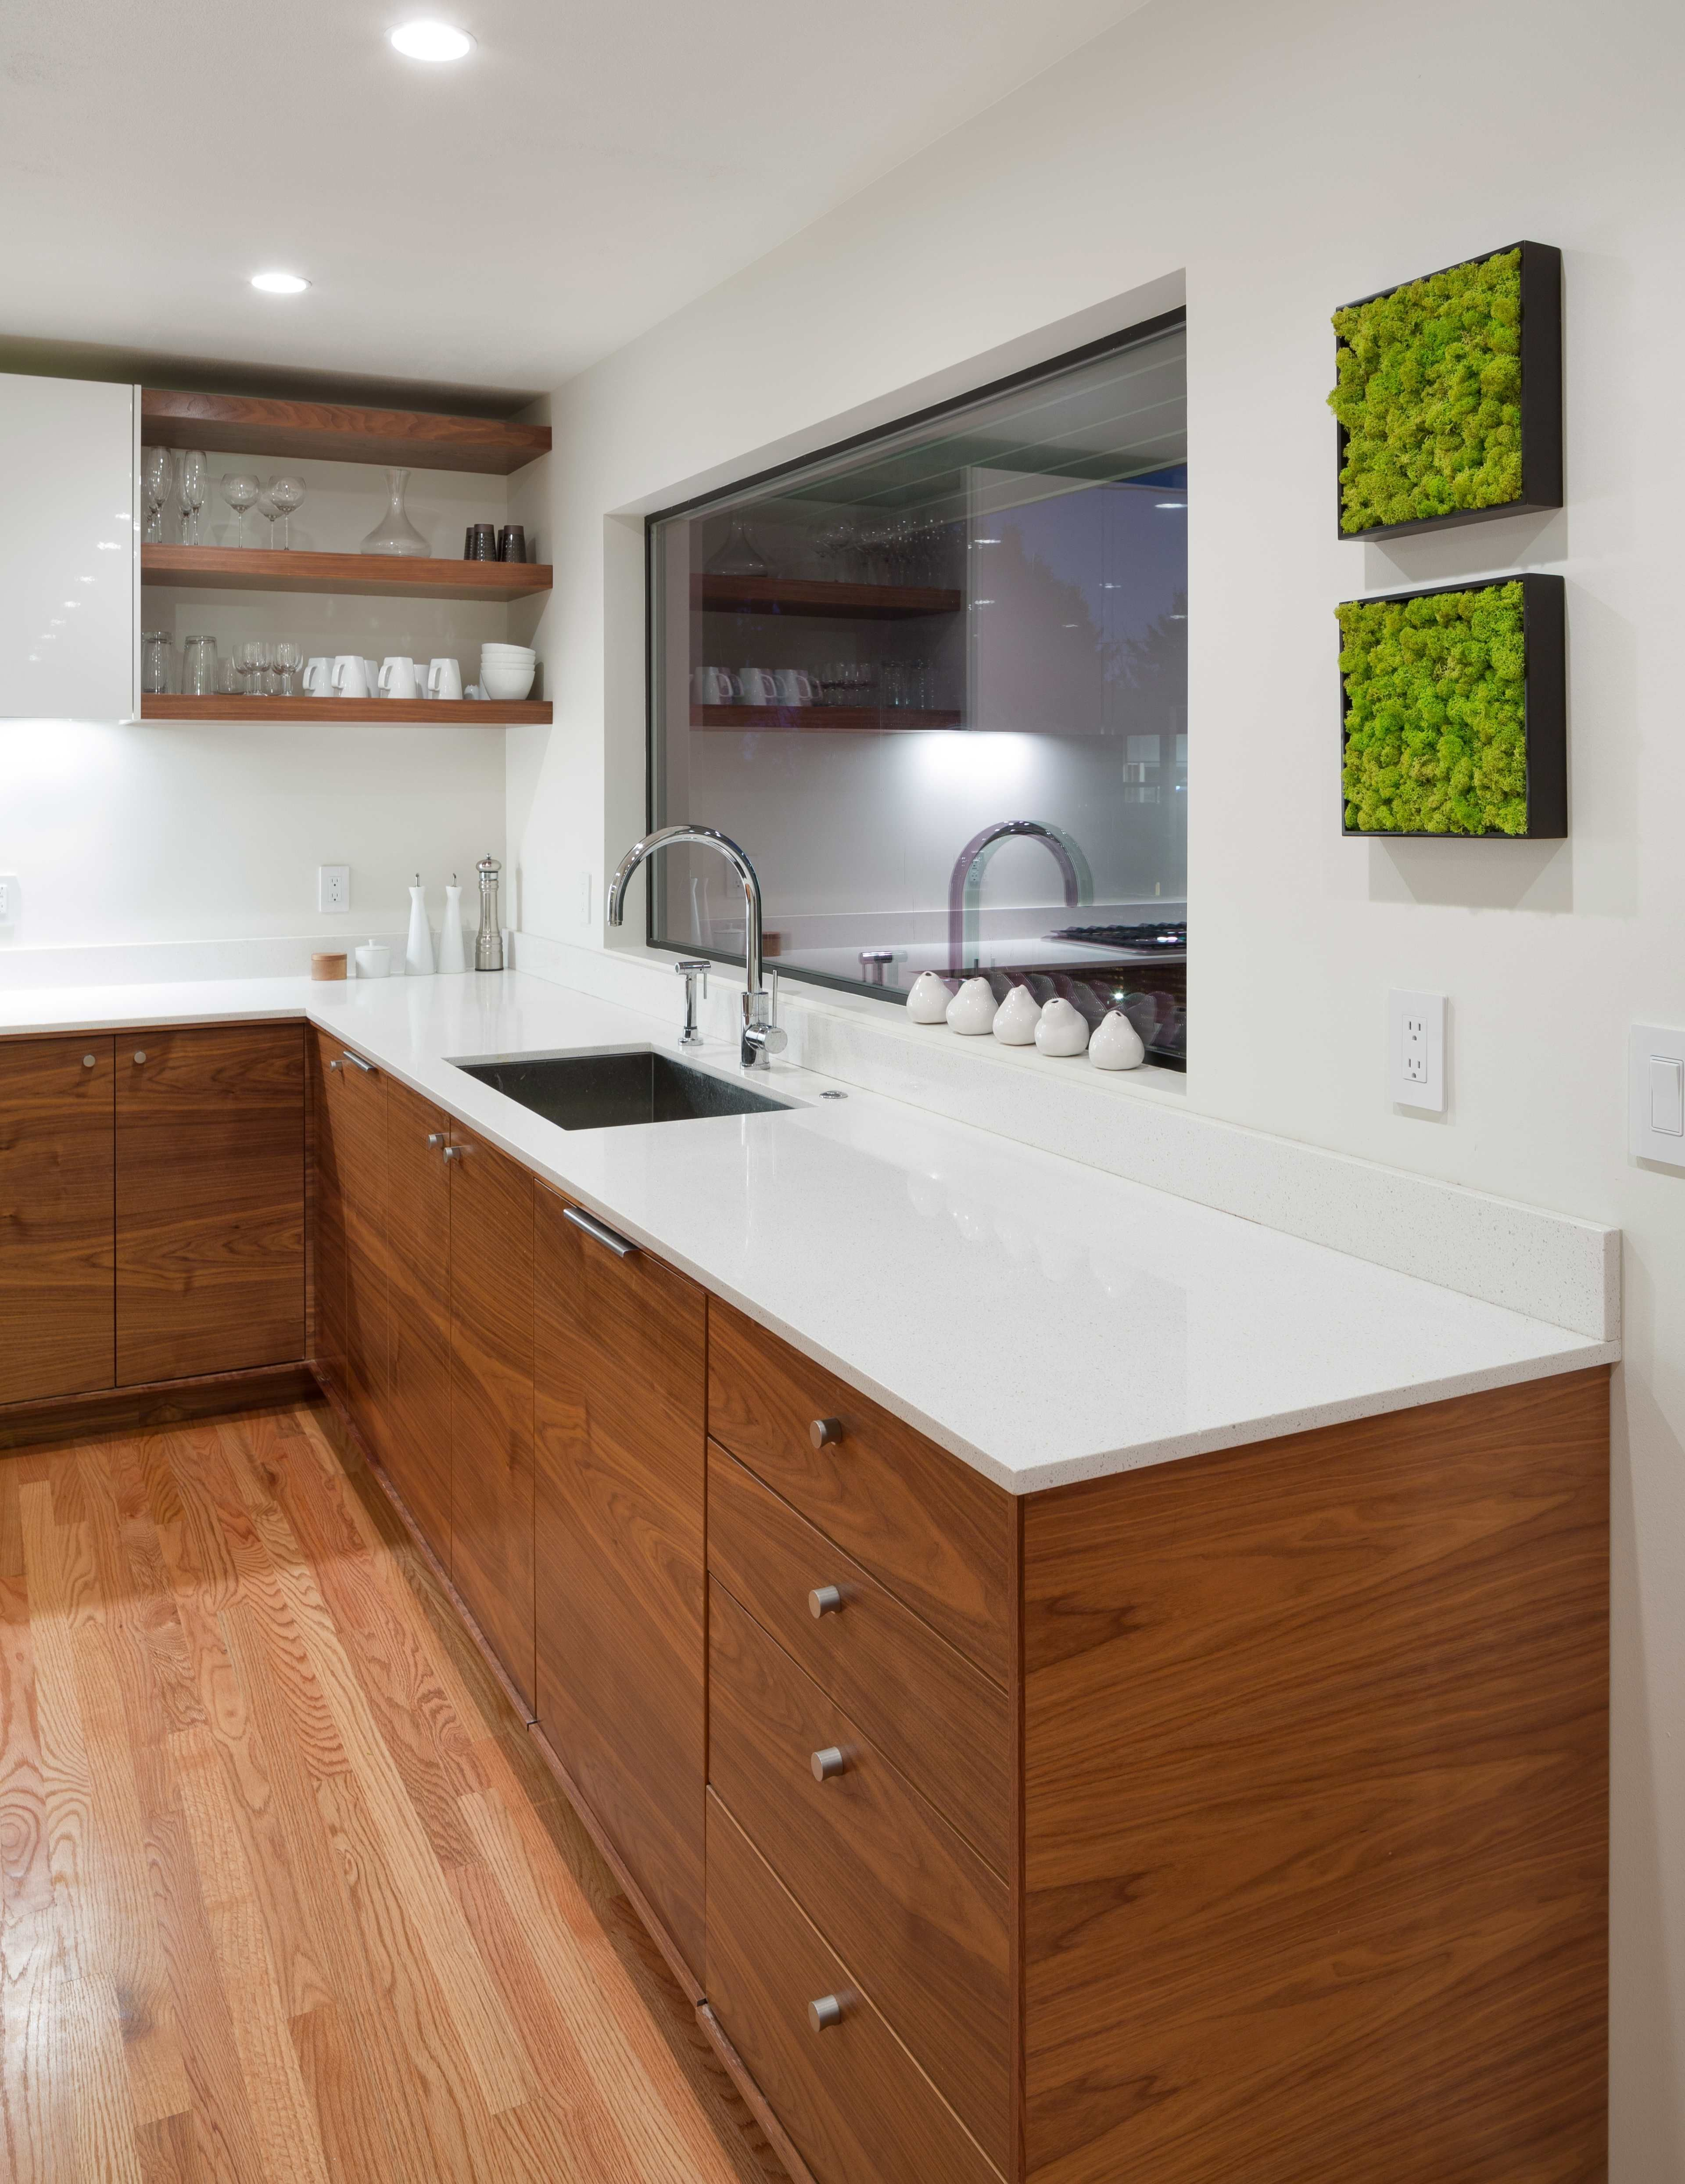 Modern kitchen design/build by Vanillawood. Grain matched